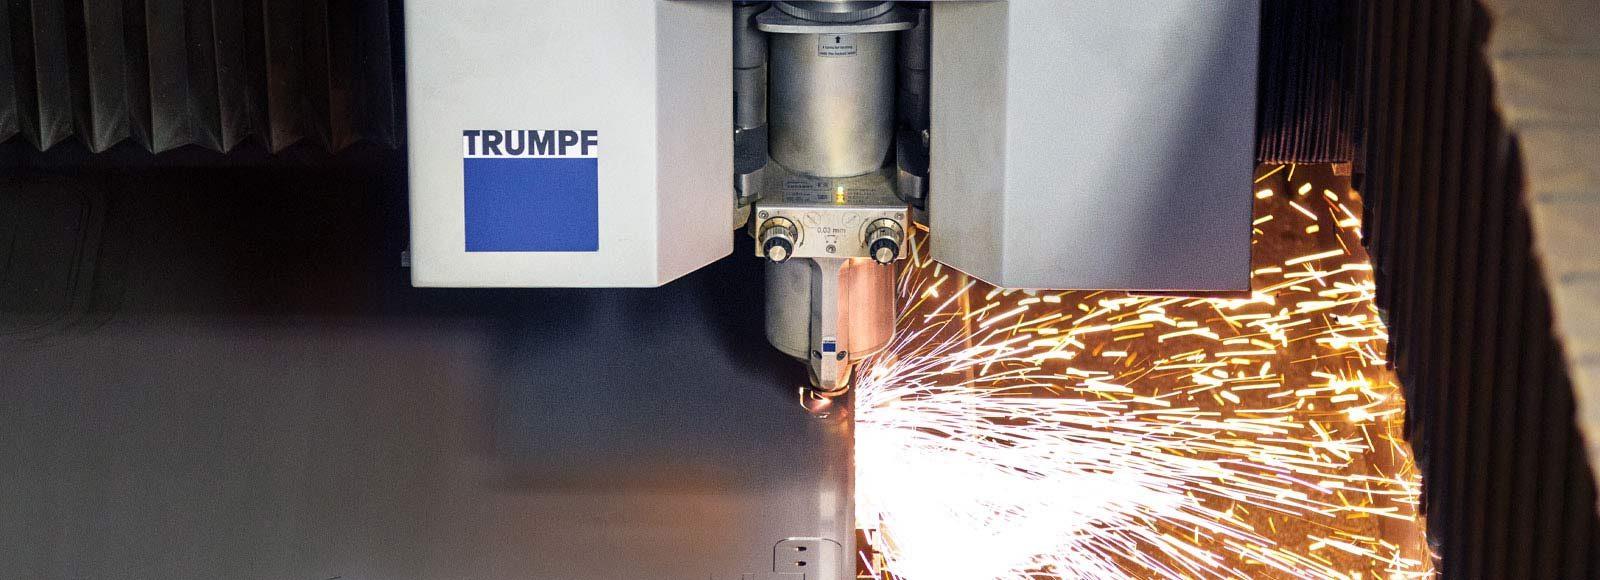 BenCo Technology - Flatsheet Laser Cutting